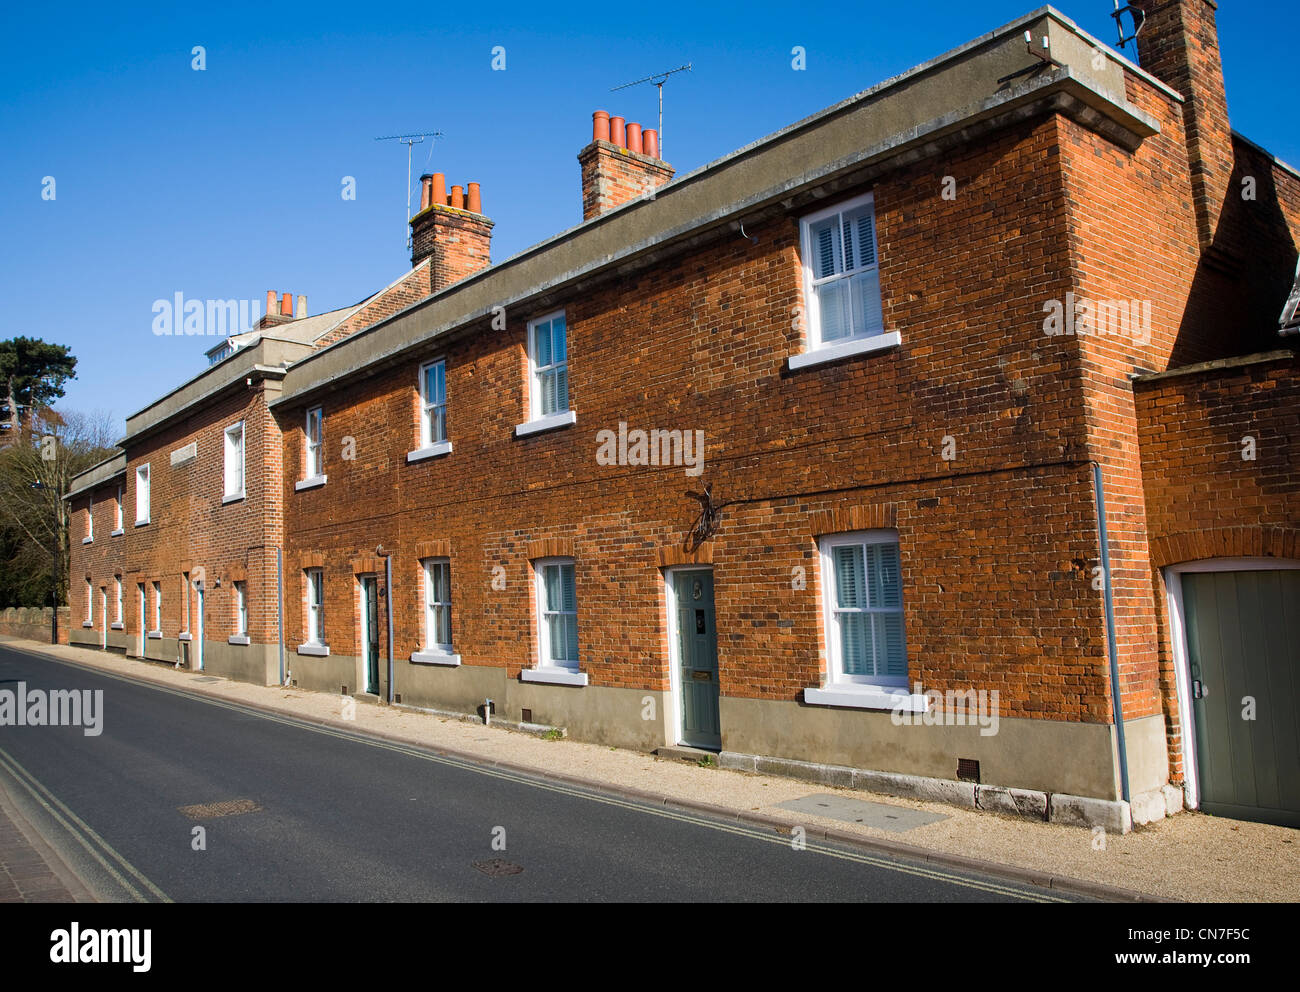 House of Correction early nineteenth century prison building, Woodbridge, Suffolk, England - Stock Image